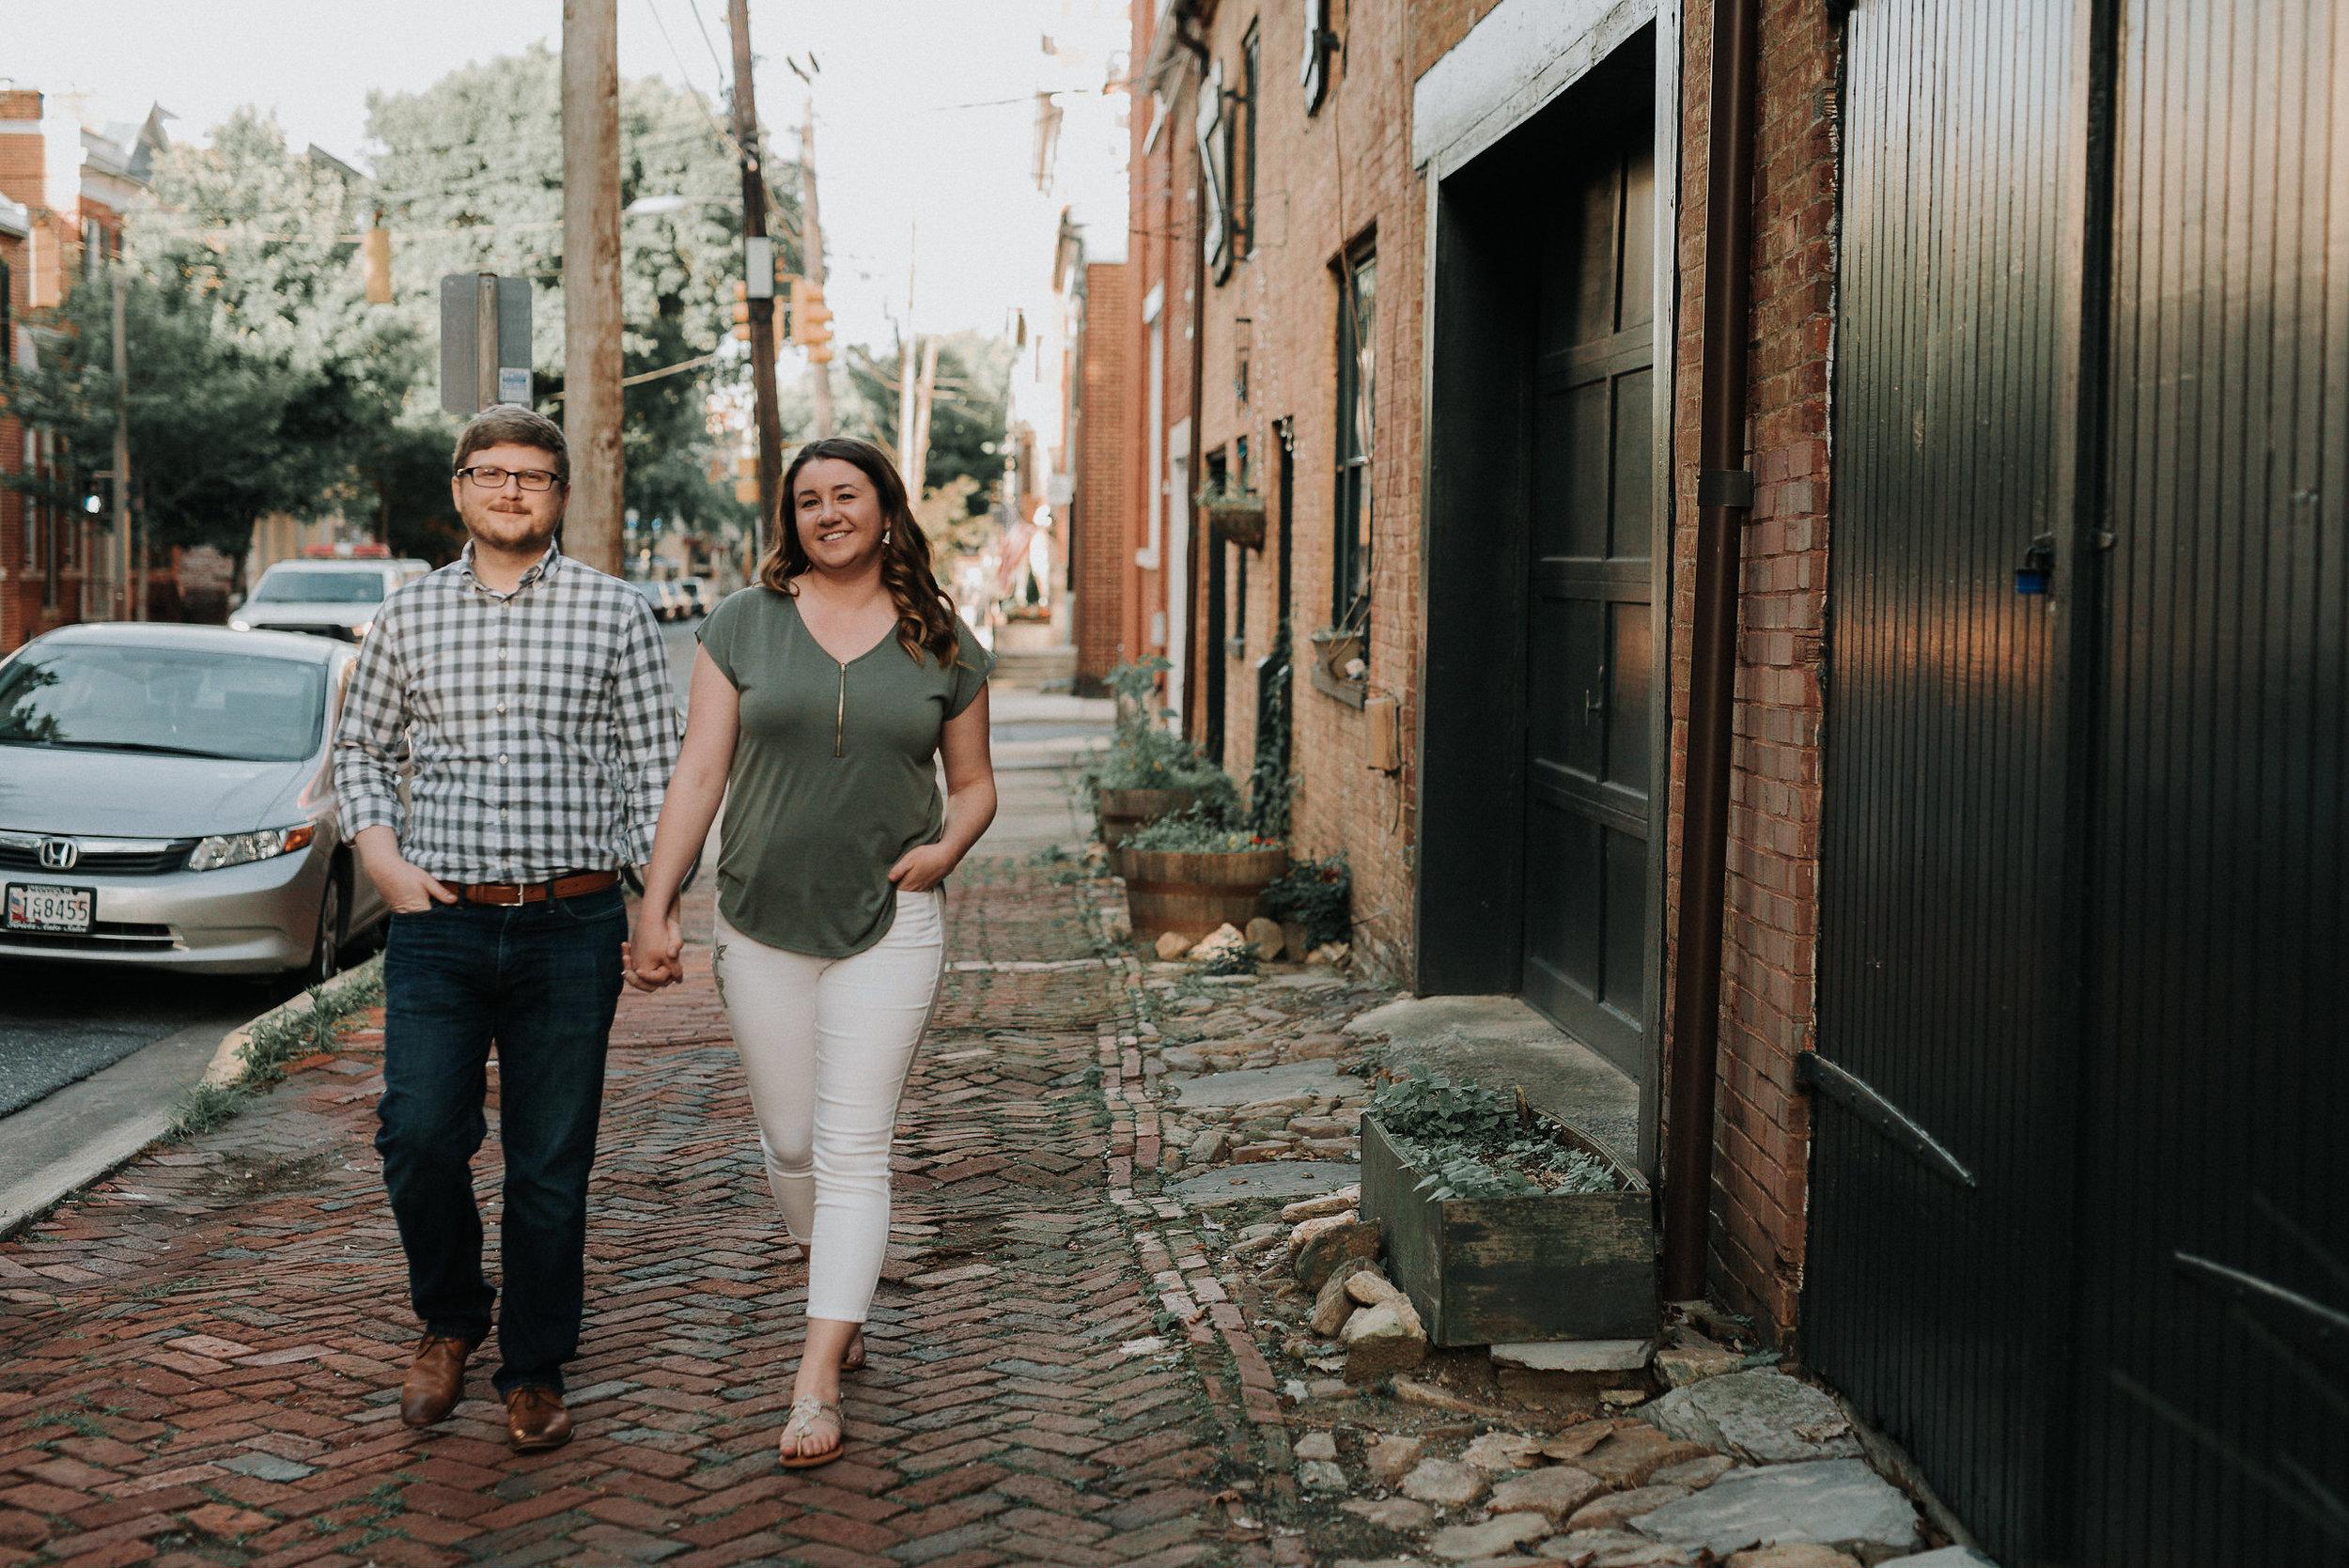 Couple walking on stone sidewalk